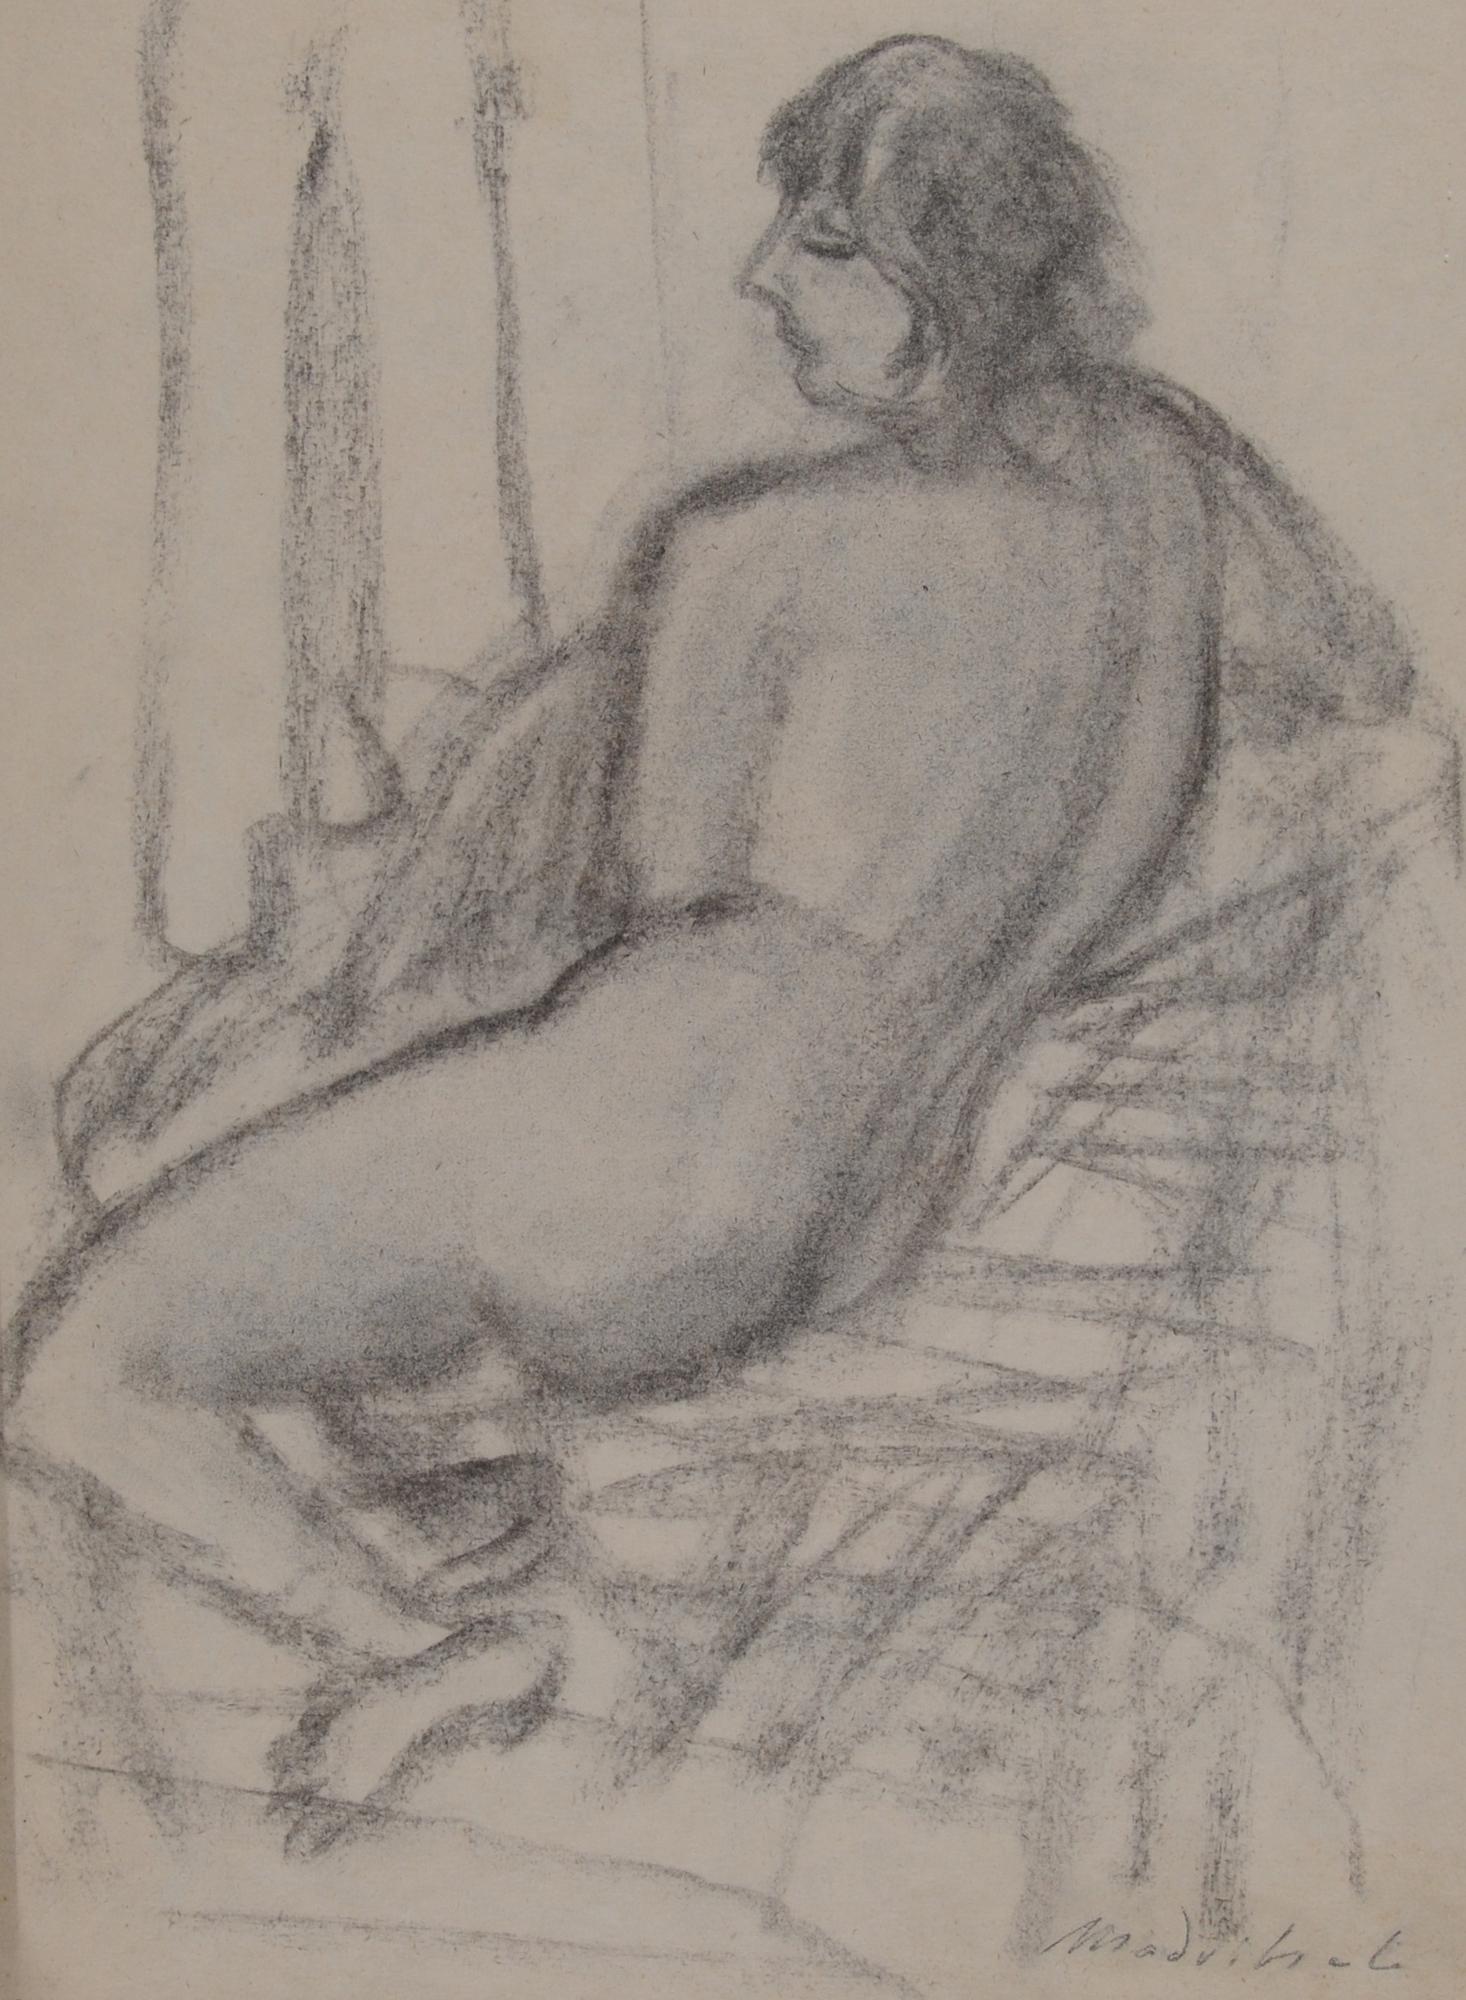 Madritsch Karl, Recto/verso: Frauenakt im Profil (Female Nude in Profile)